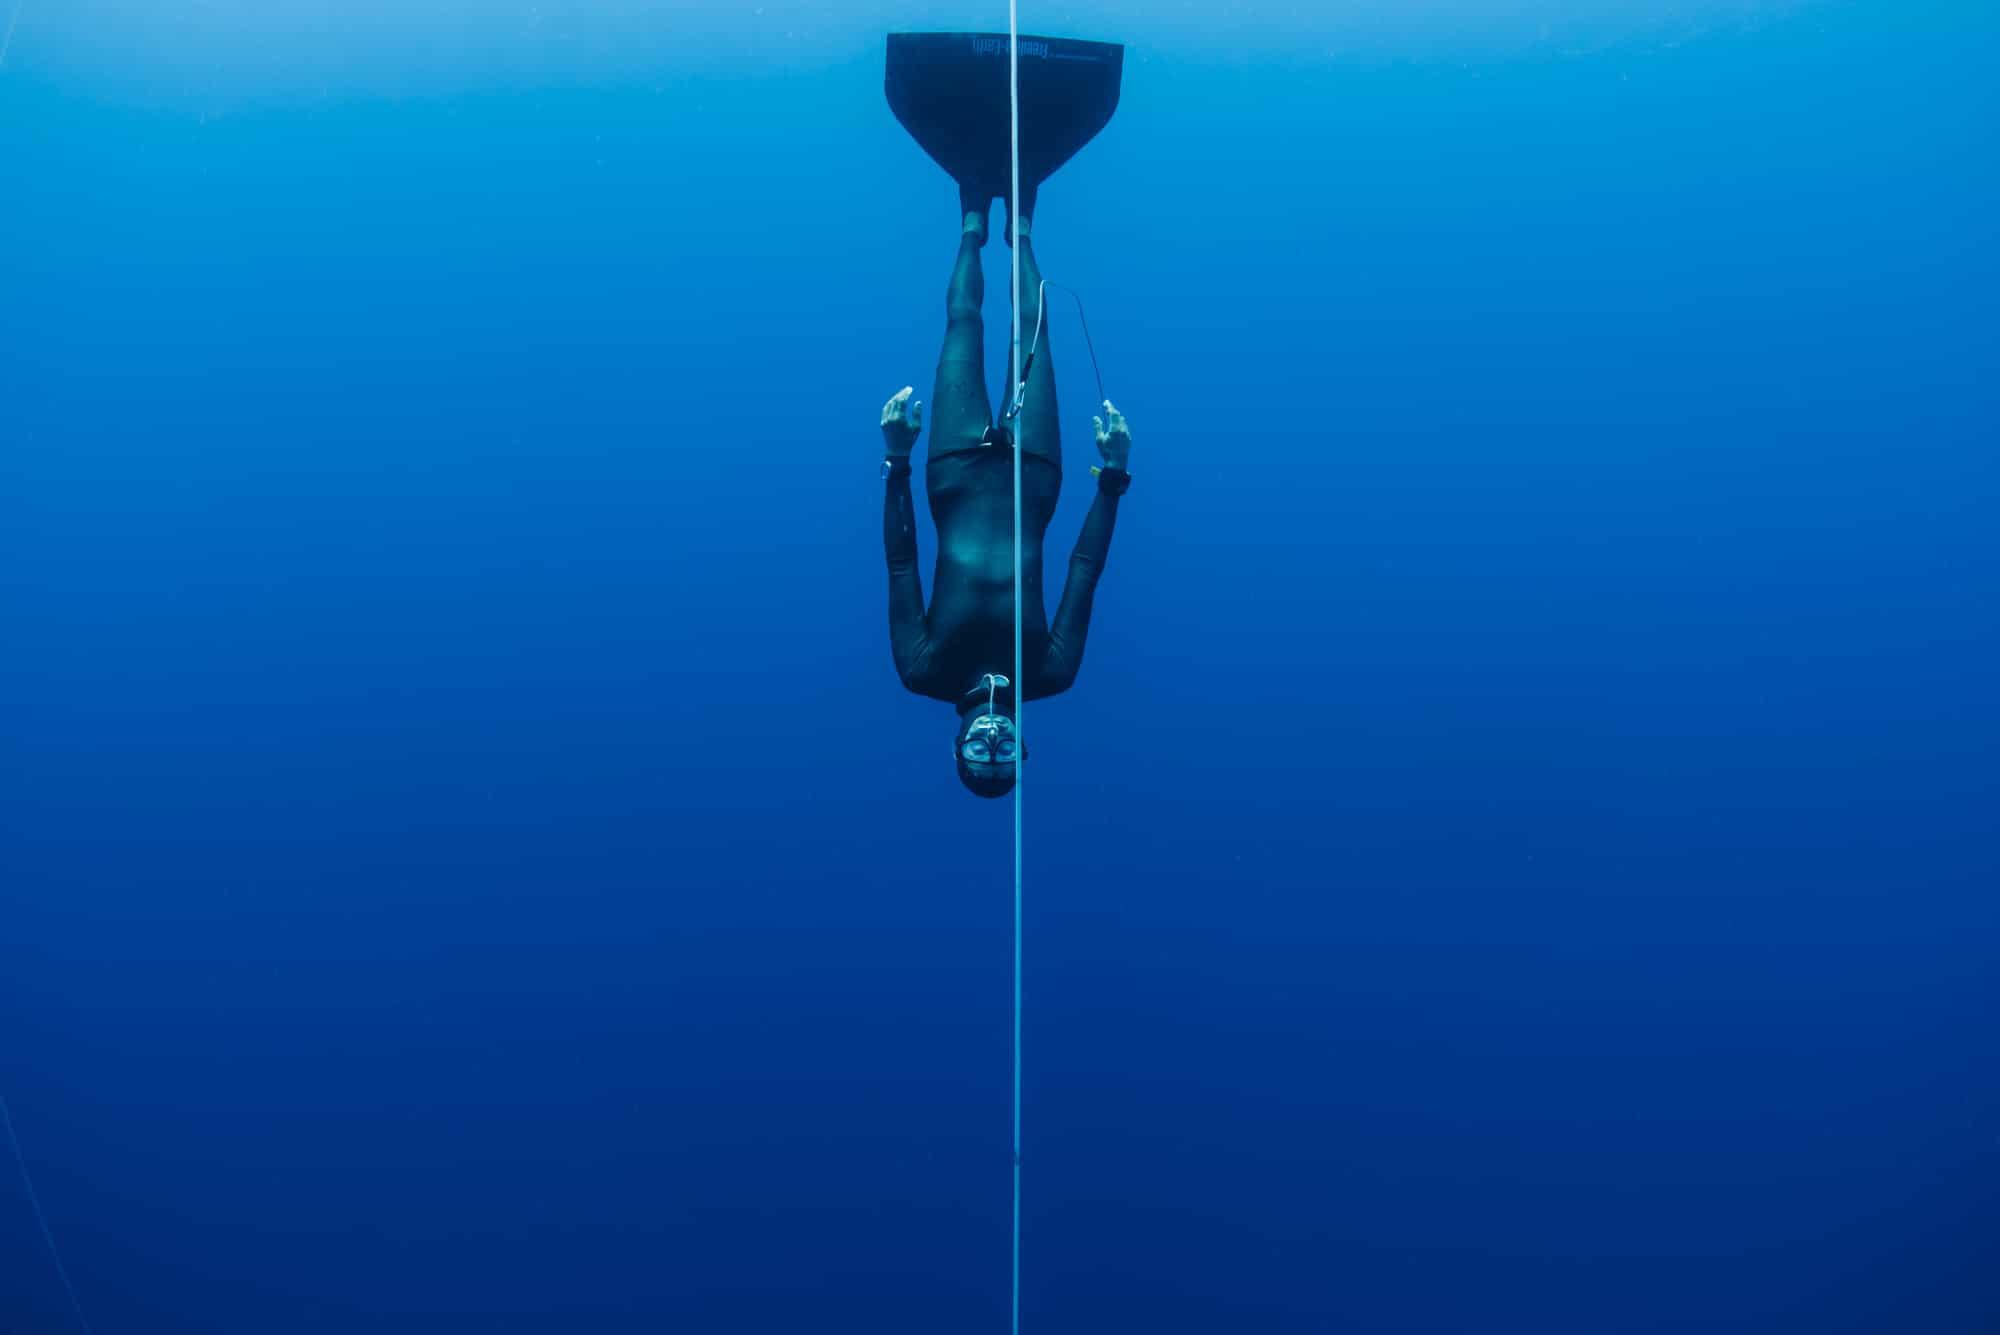 Apnée : Christophe Leray en immersion libre